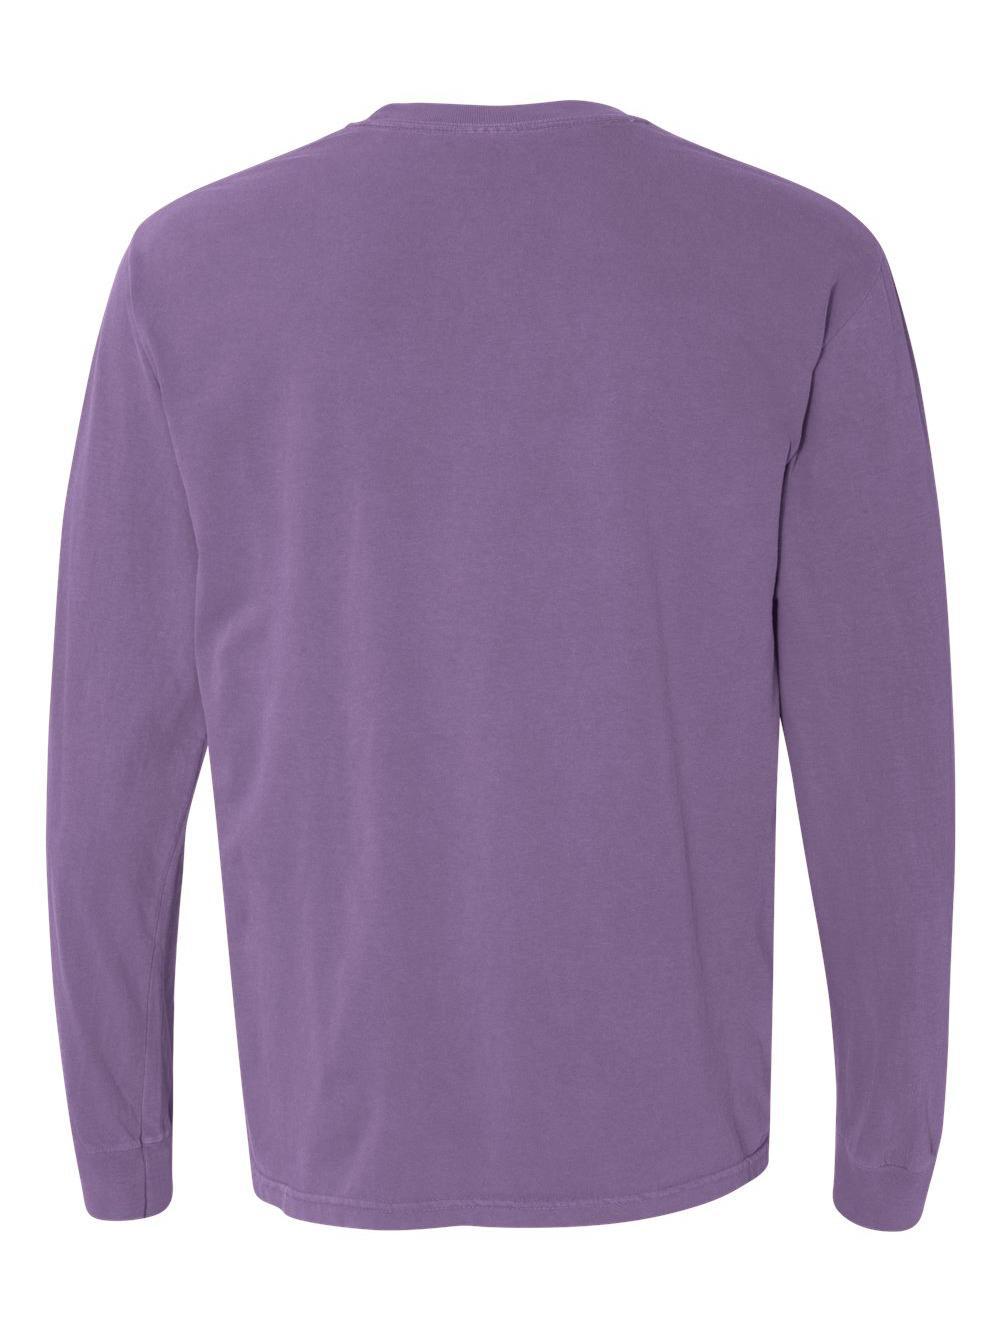 Comfort-Colors-Garment-Dyed-Heavyweight-Ringspun-Long-Sleeve-T-Shirt-6014 thumbnail 67